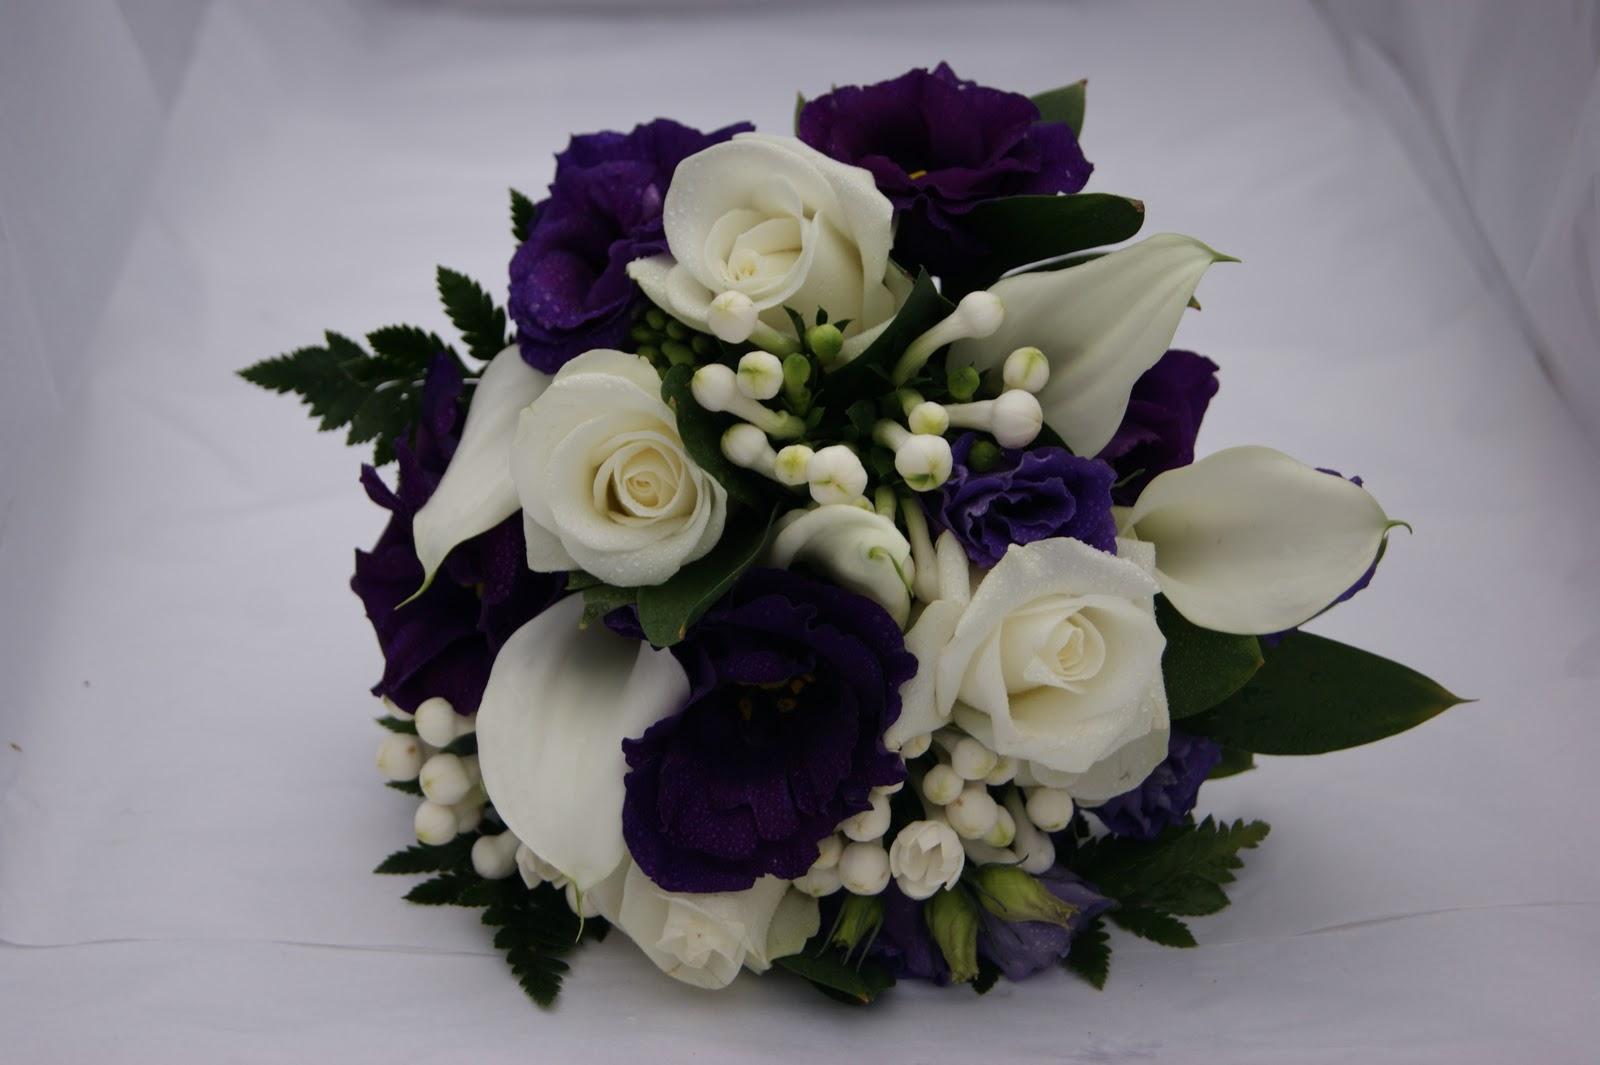 Wedding Flowers For November Wedding : Flowers for november wedding